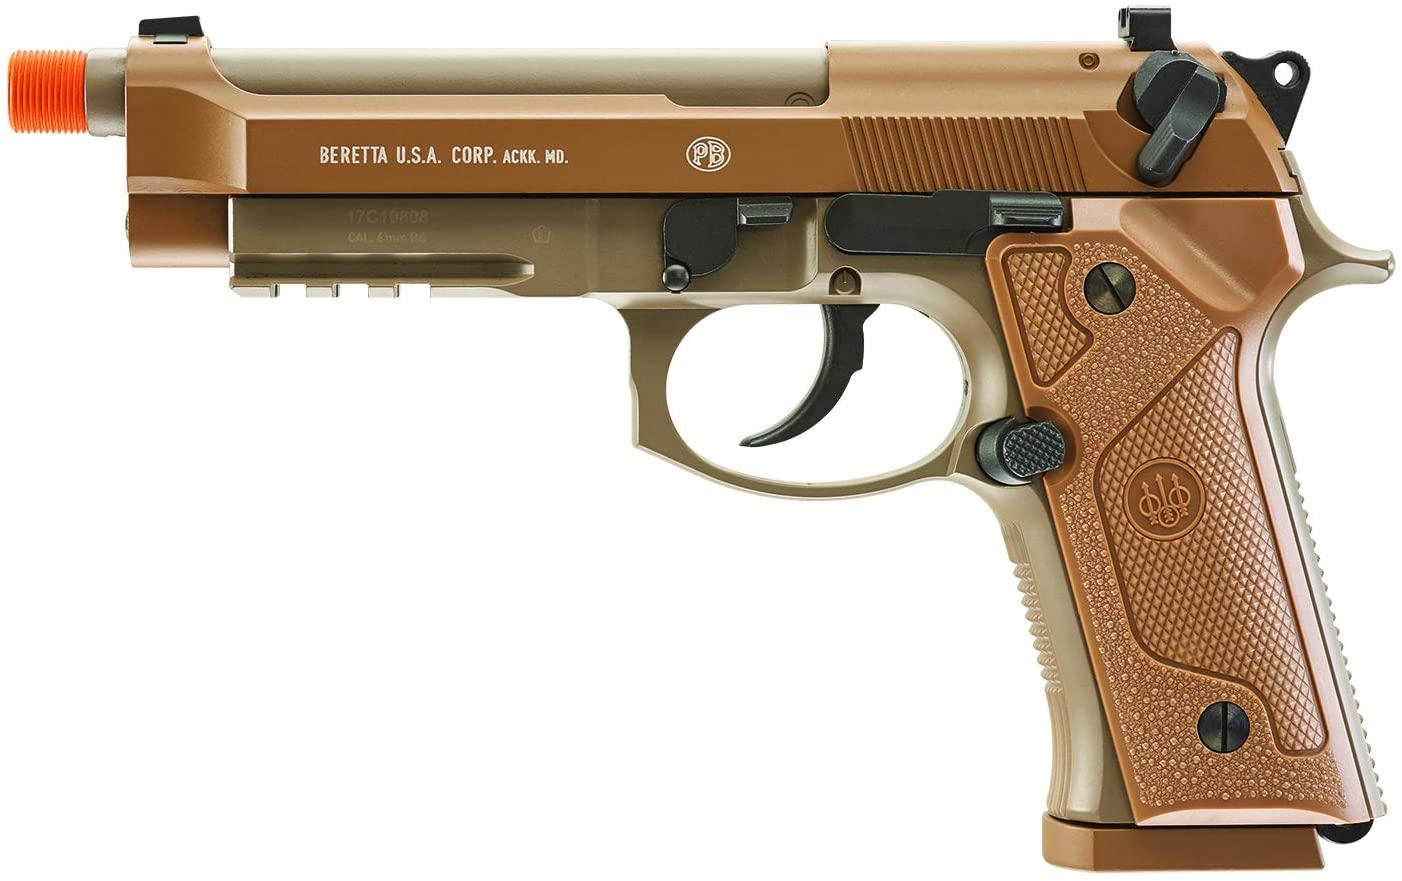 Beretta M92 A3 Co2 Blowback Airsoft Pistol Semi/Full-Auto